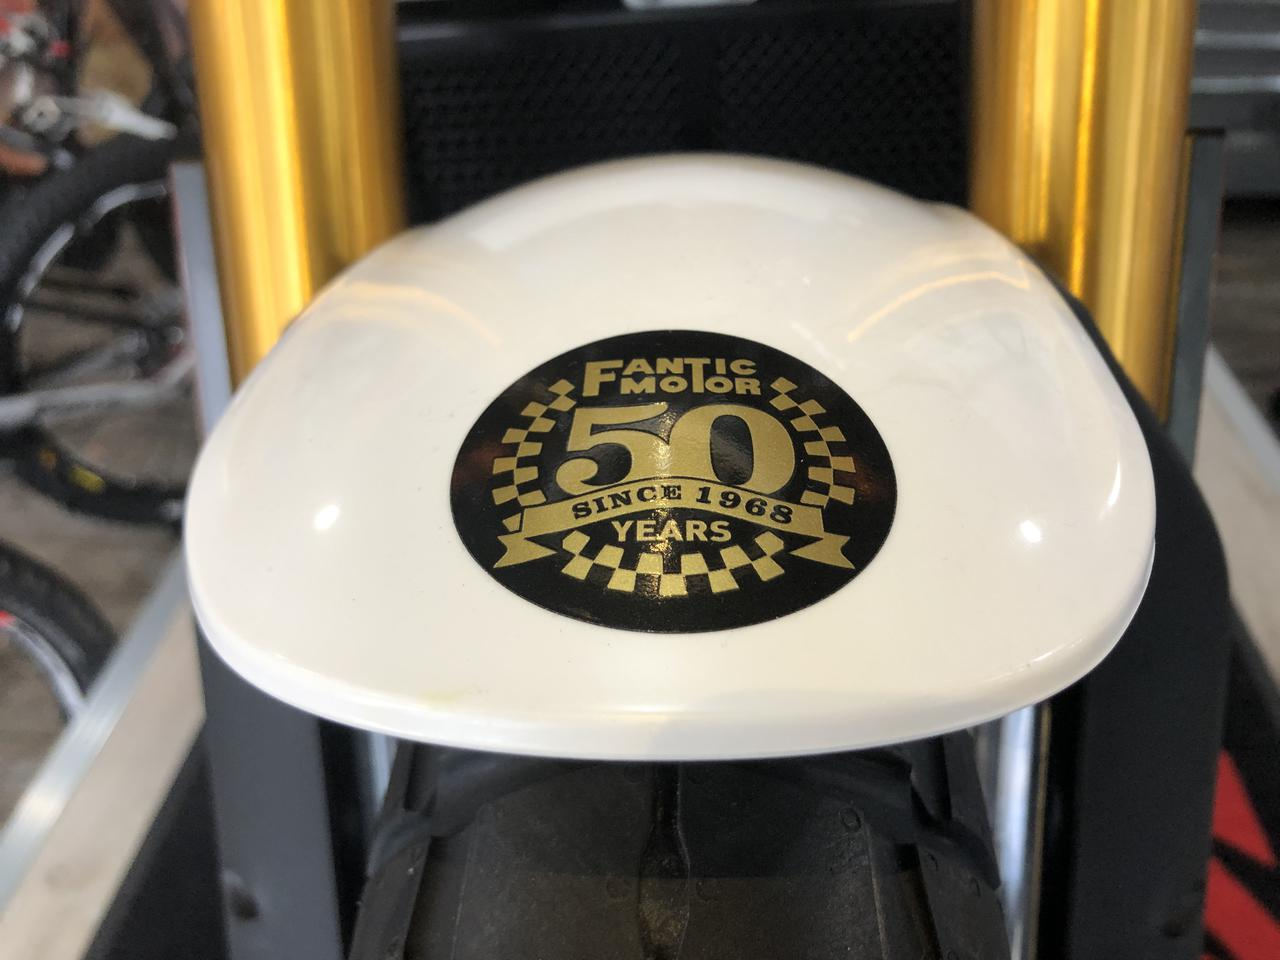 Images : 11番目の画像 - FANTIC「CABALLERO SCRAMBLER 500 ANNIVERSARY」の写真をもっと見る - webオートバイ